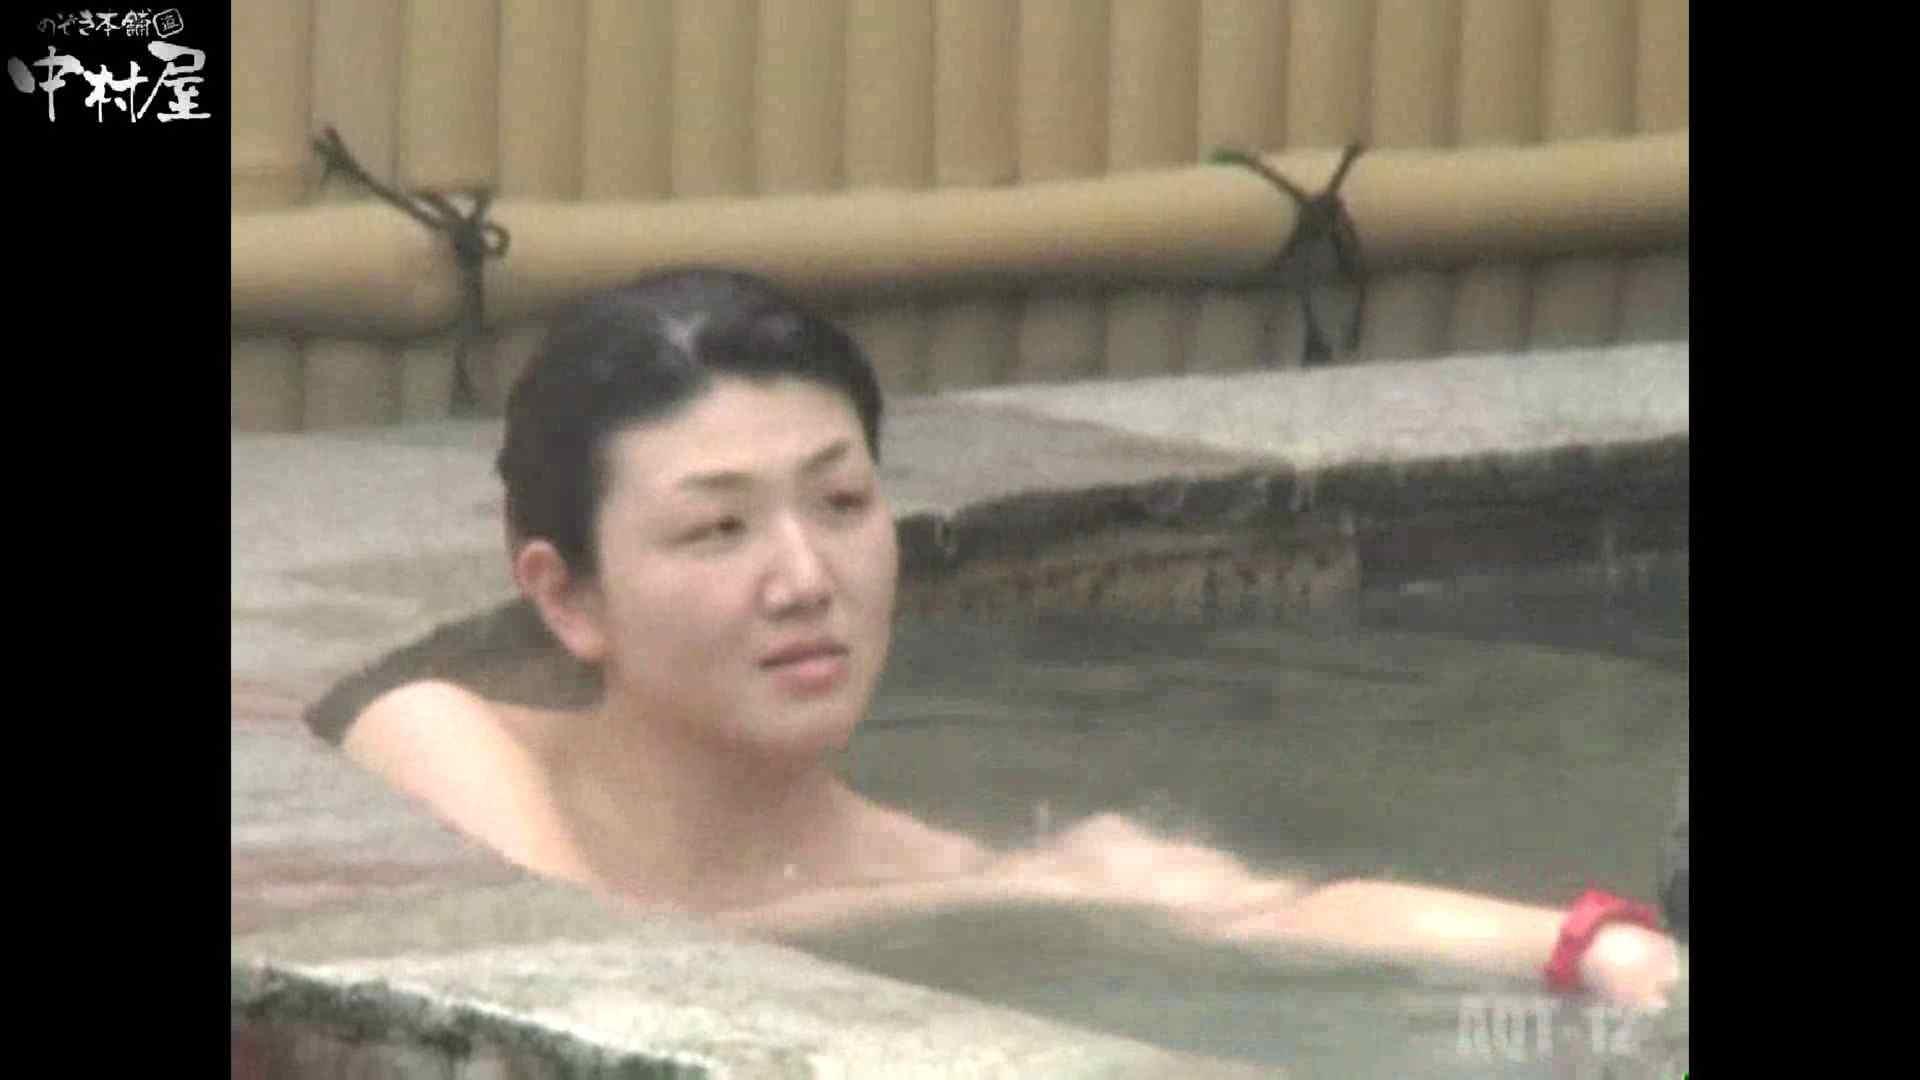 Aquaな露天風呂Vol.876潜入盗撮露天風呂十二判湯 其の六 美しいOLの裸体 AV無料動画キャプチャ 107pic 62